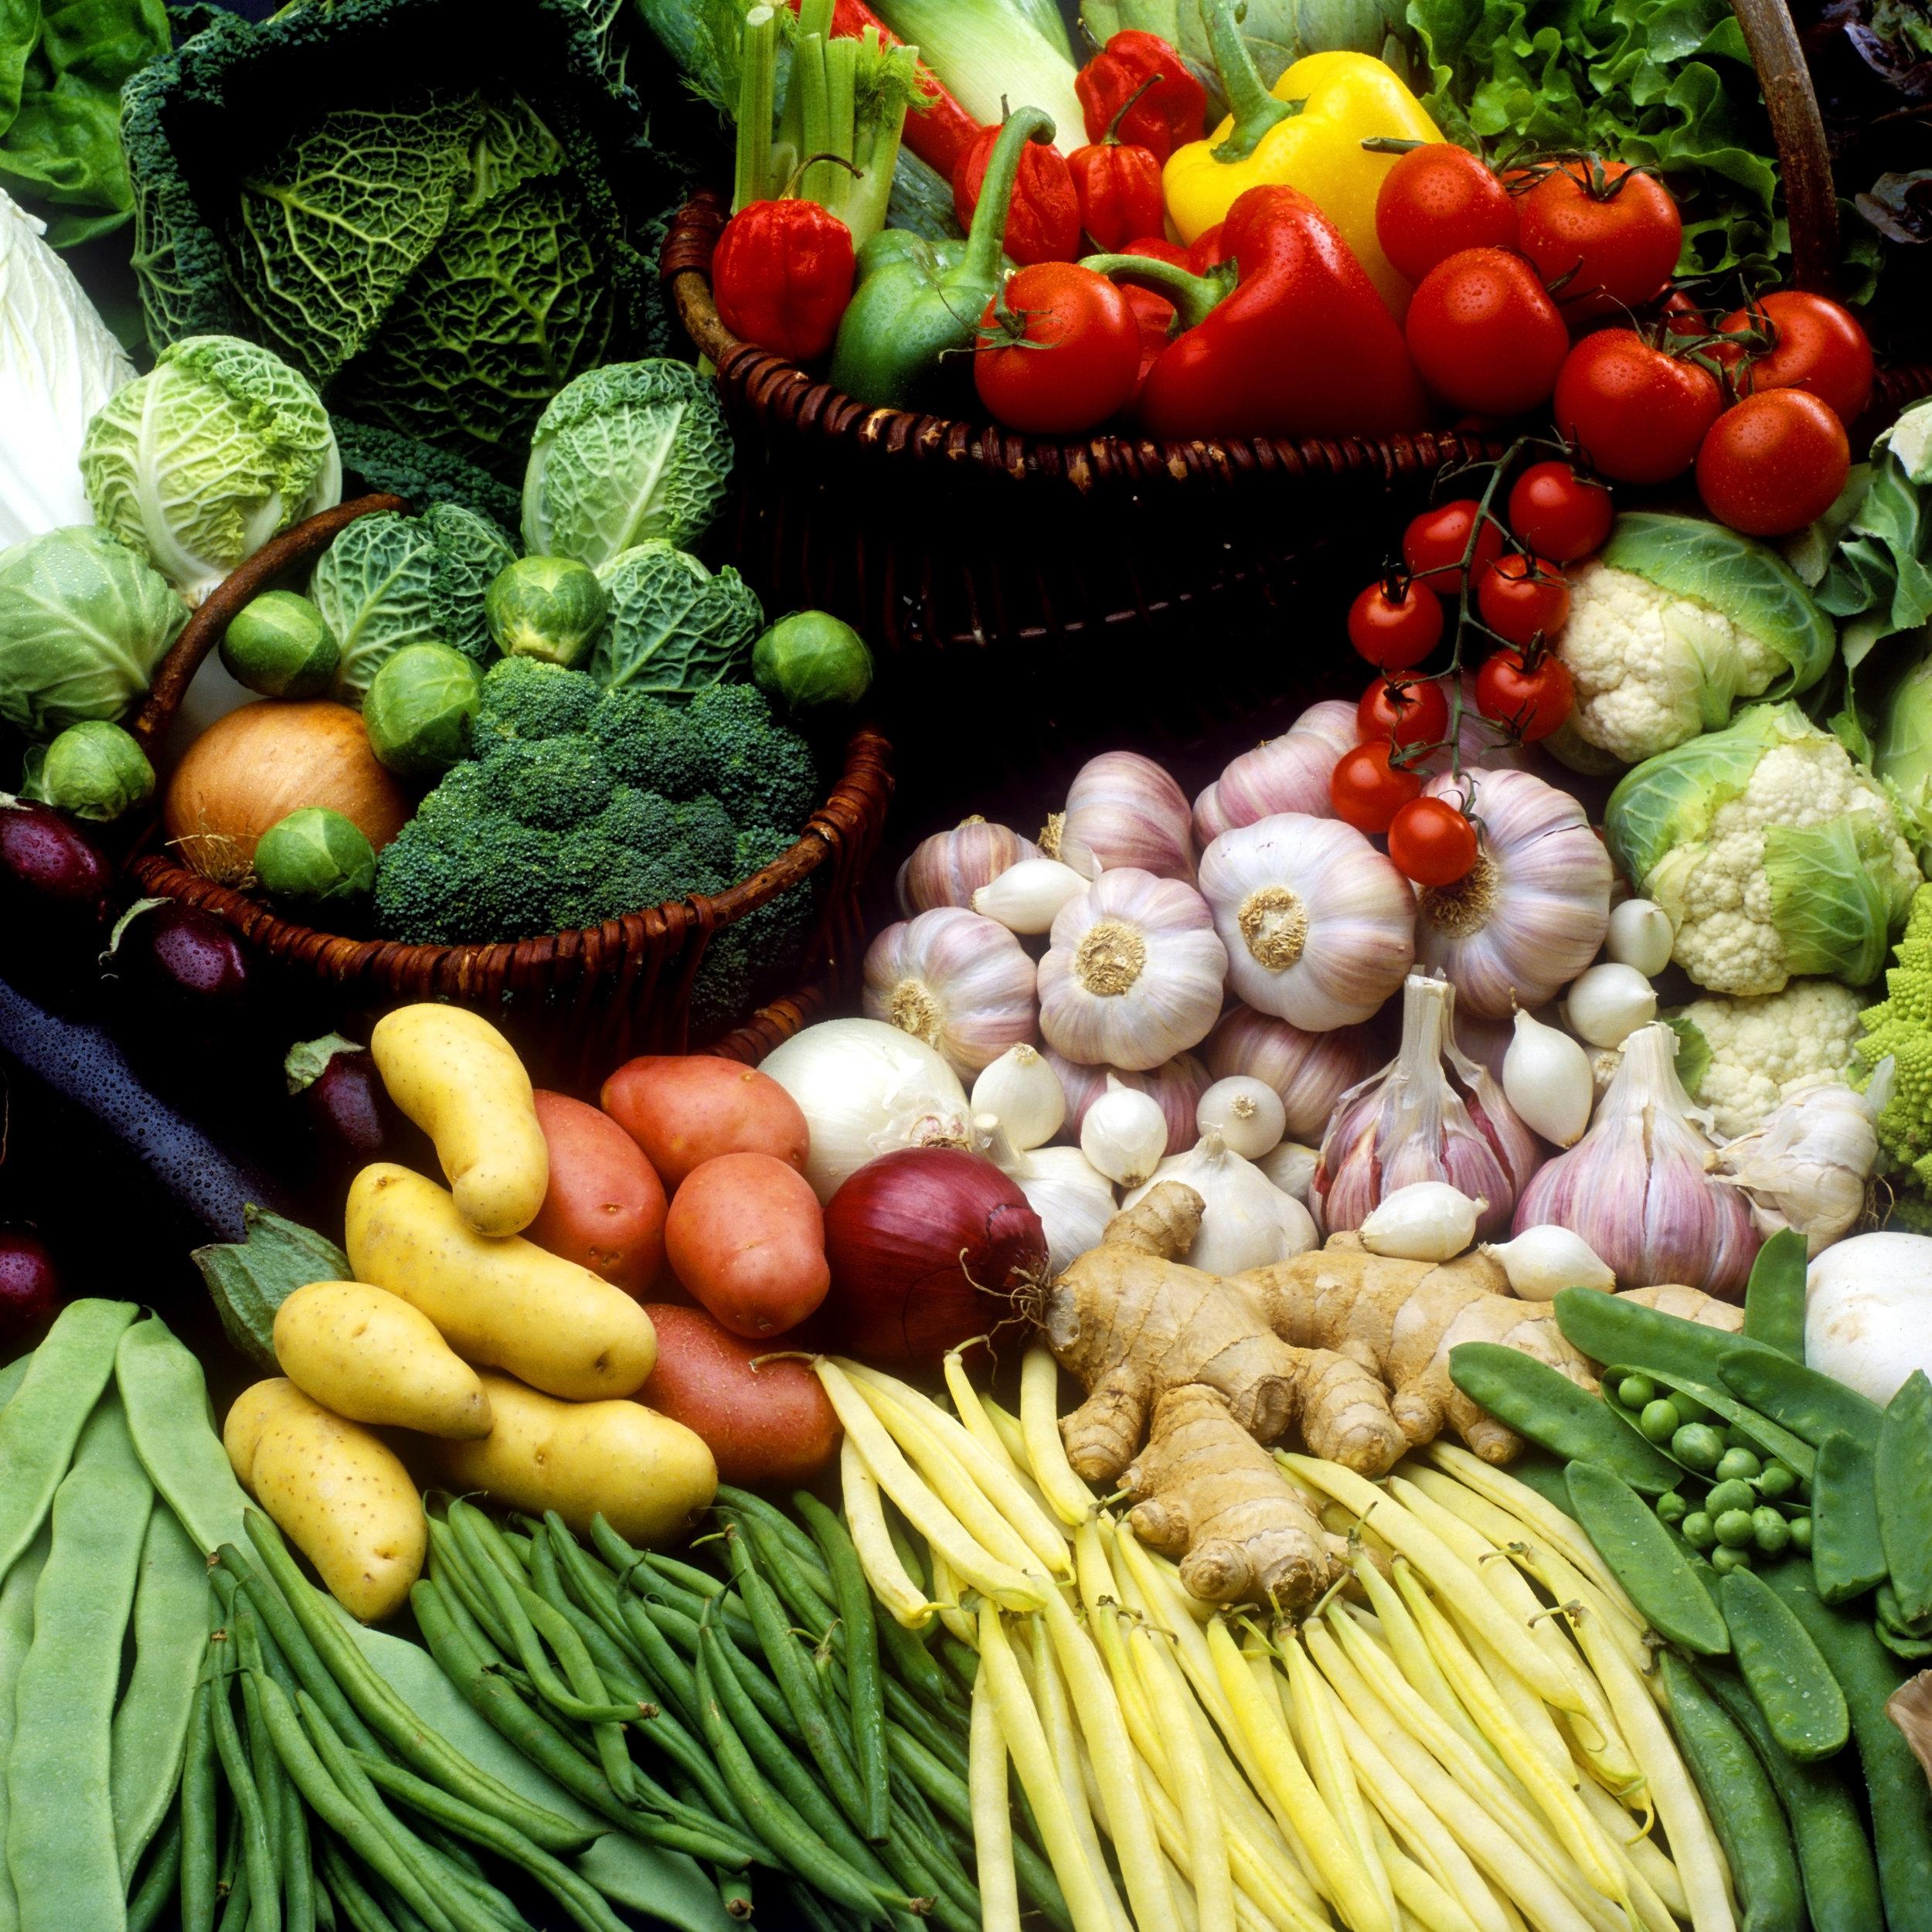 vegetable-still-life photo.jpg